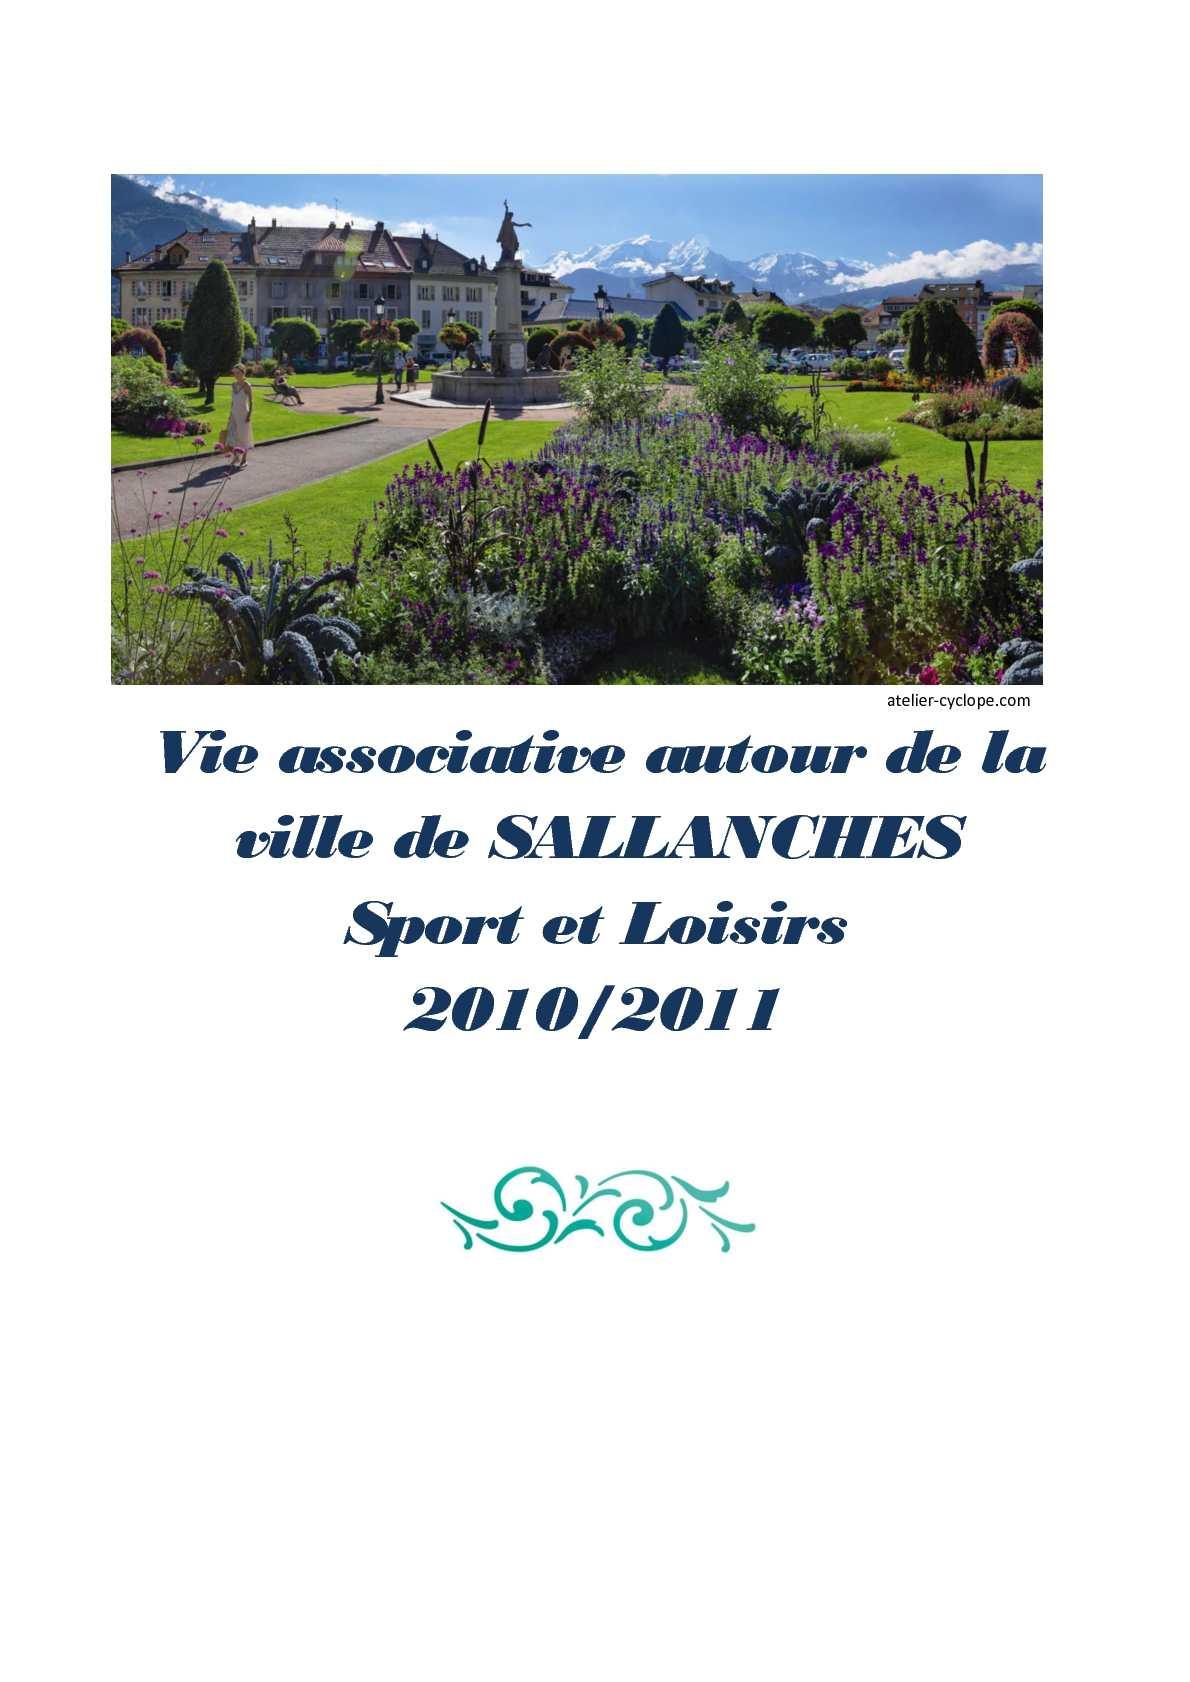 Calam o vie associative autour de la ville de sallanches - Piscine sallanches ...